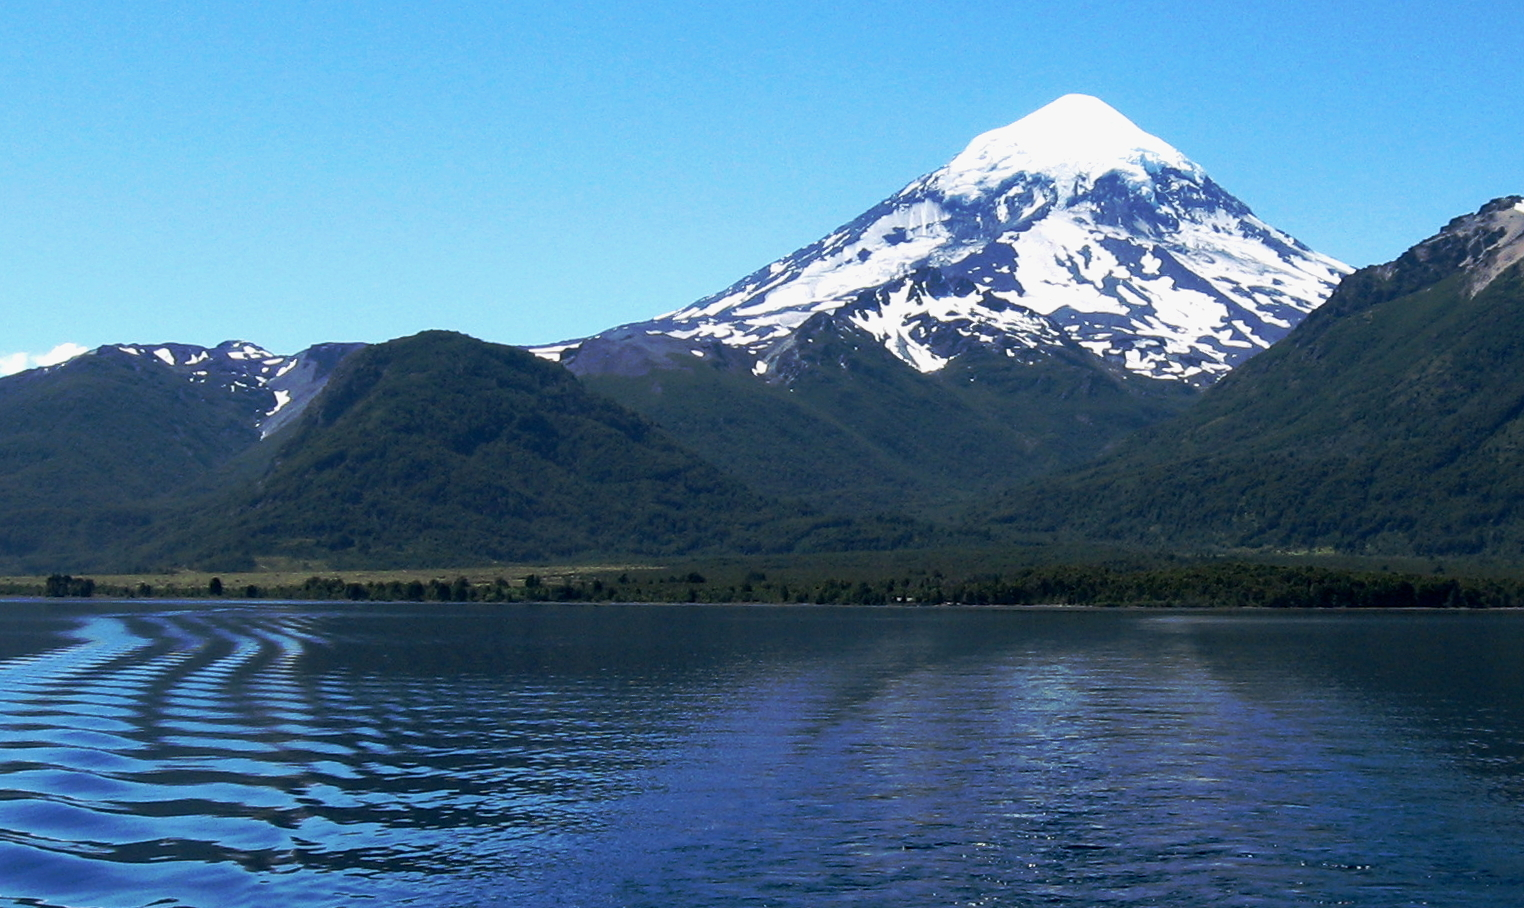 Volcán Lanín - Wikipedia, la enciclopedia libre